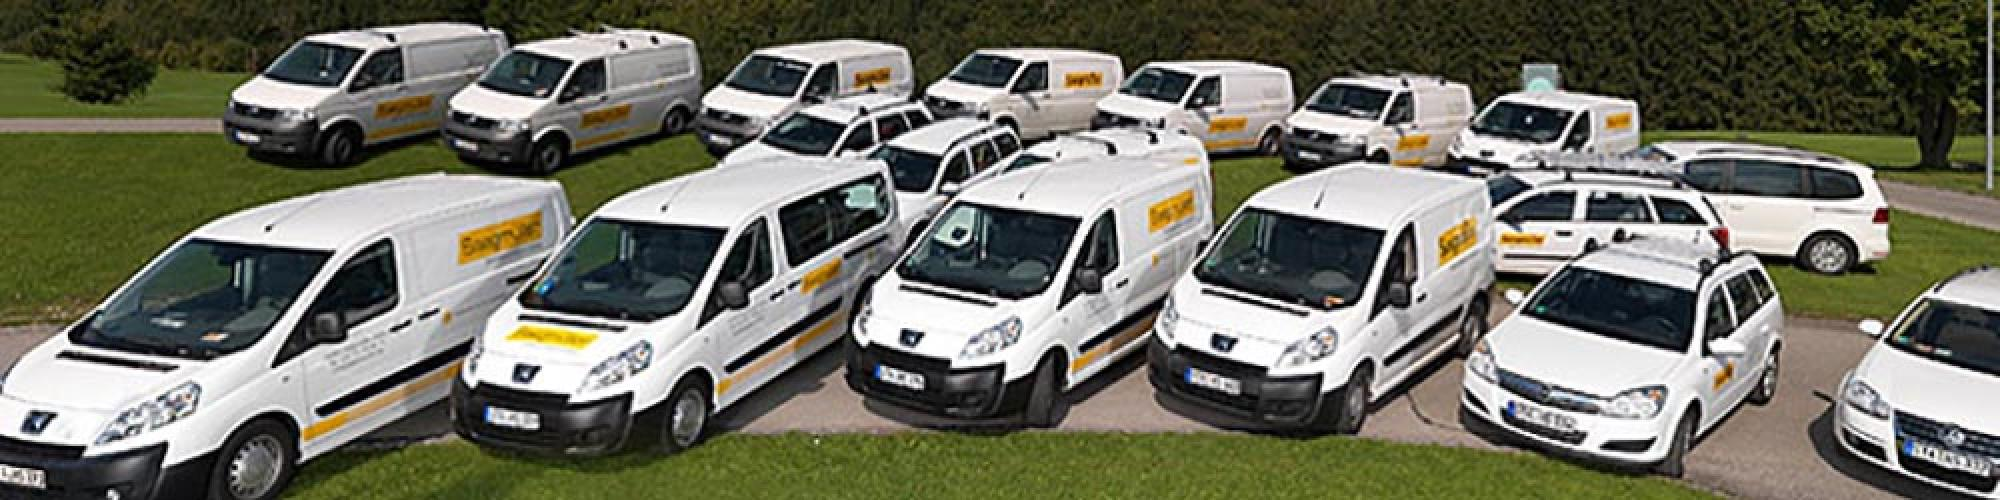 Elektro Saegmüller GmbH